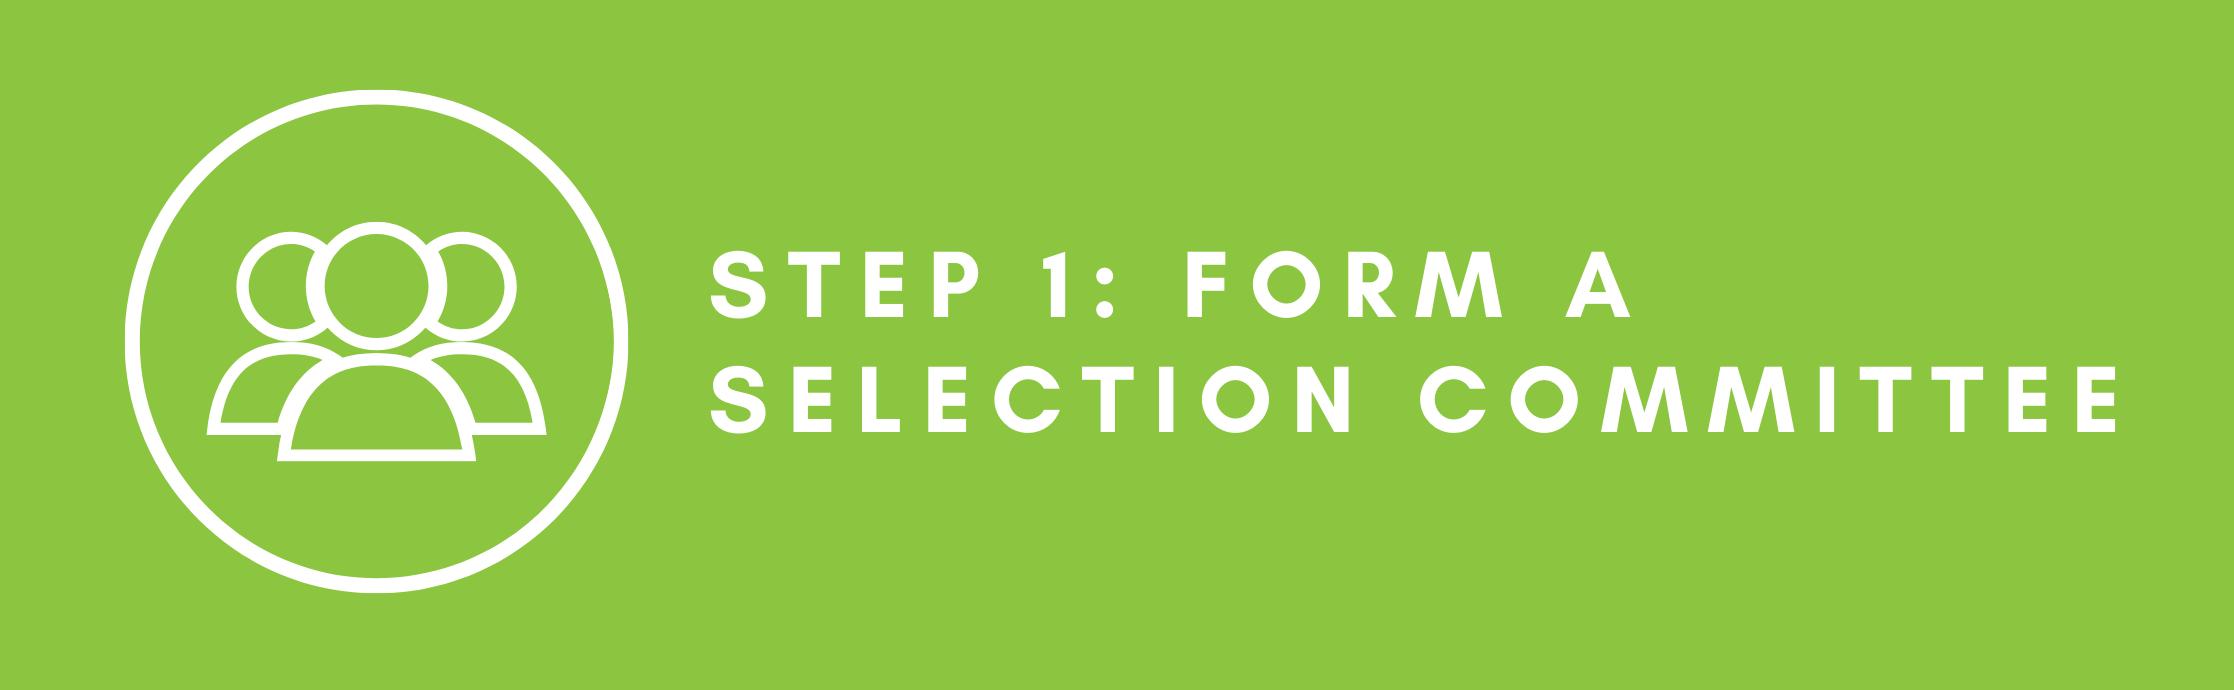 choosing-nonprofit-crm-step-1